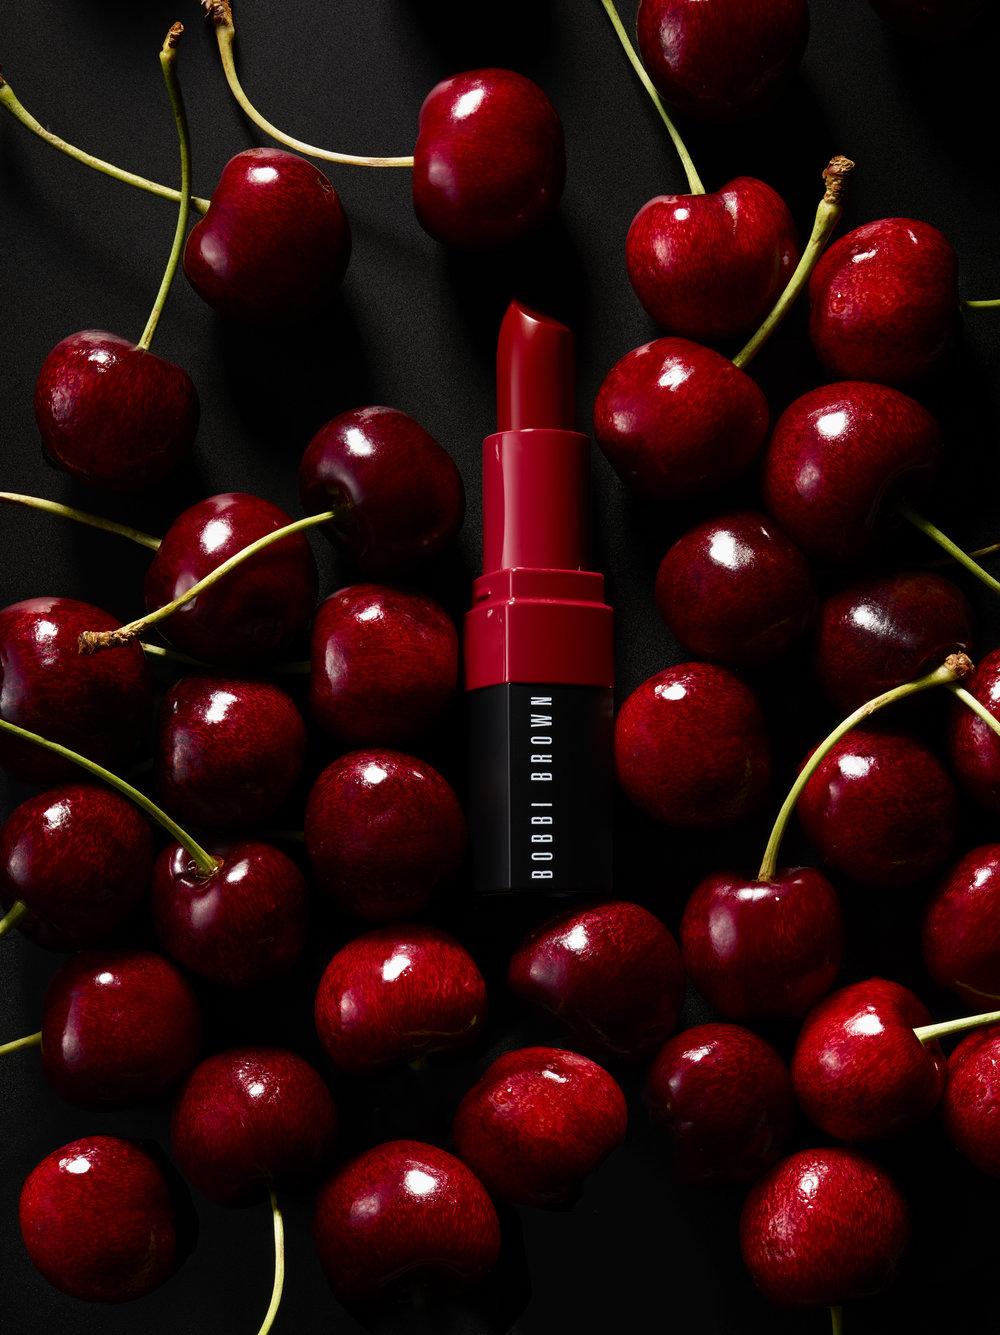 Cherry-FOCBra186-190r1_2.jpg